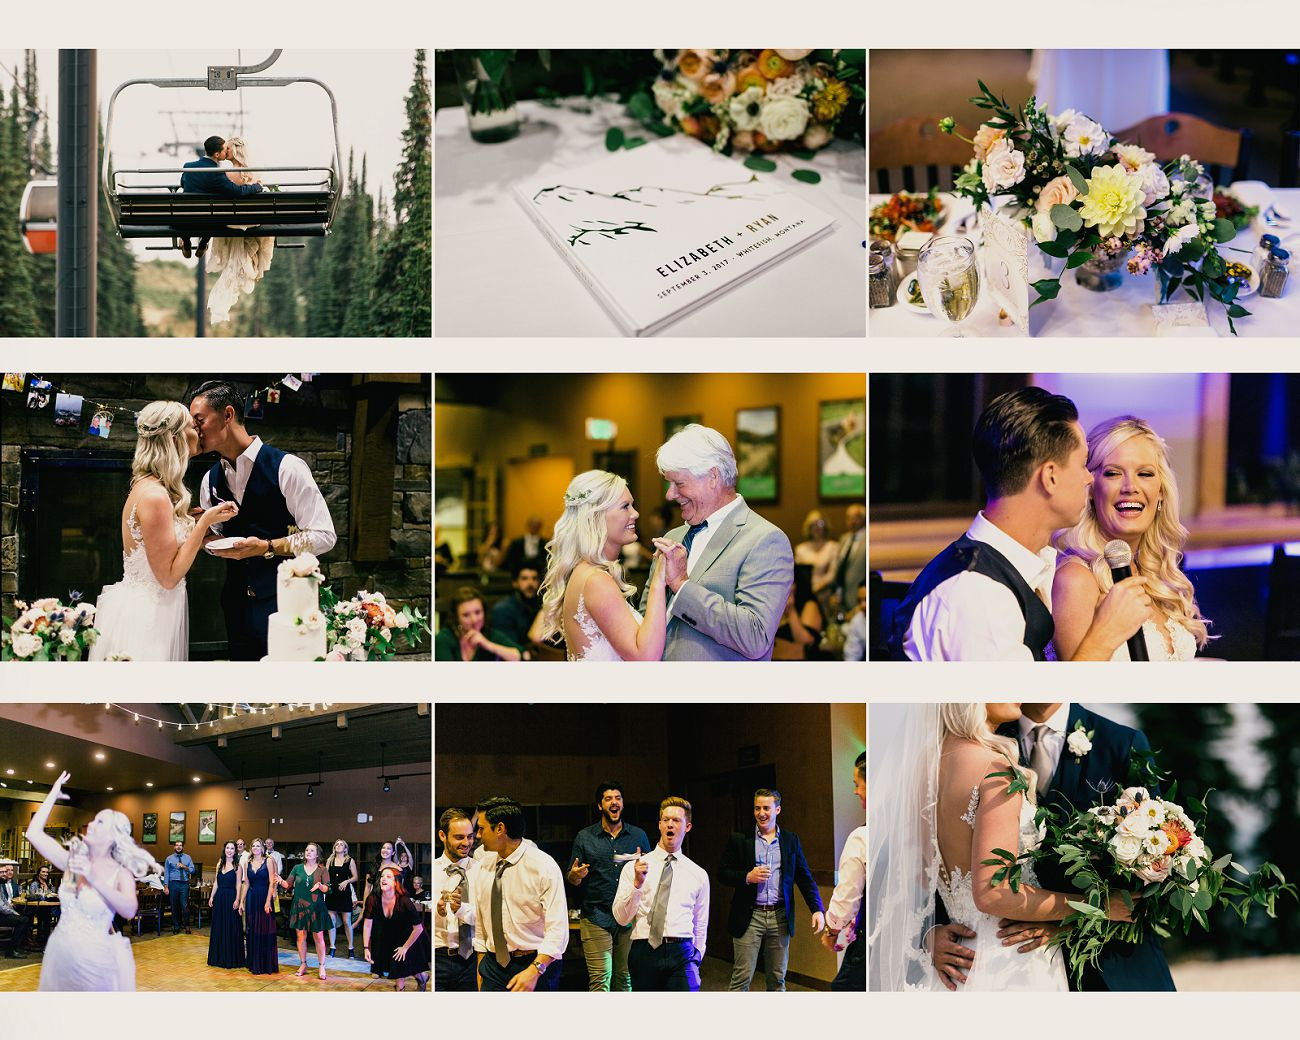 Jennifer_Mooney_Photo_Whitefish_mountain_resort_wedding_elegant_montana_wedding_013.jpg